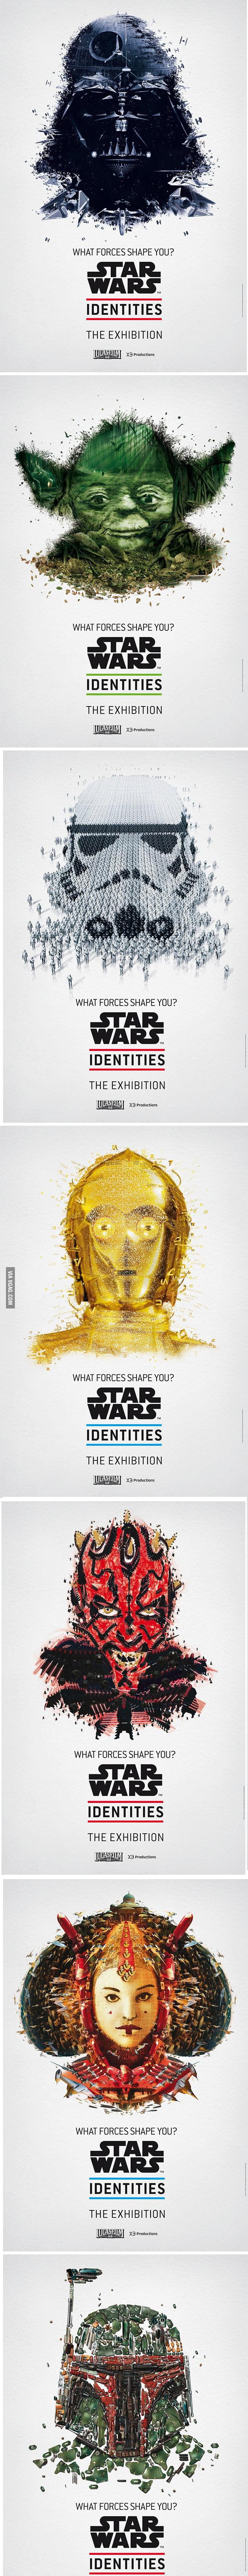 Star Wars shapes